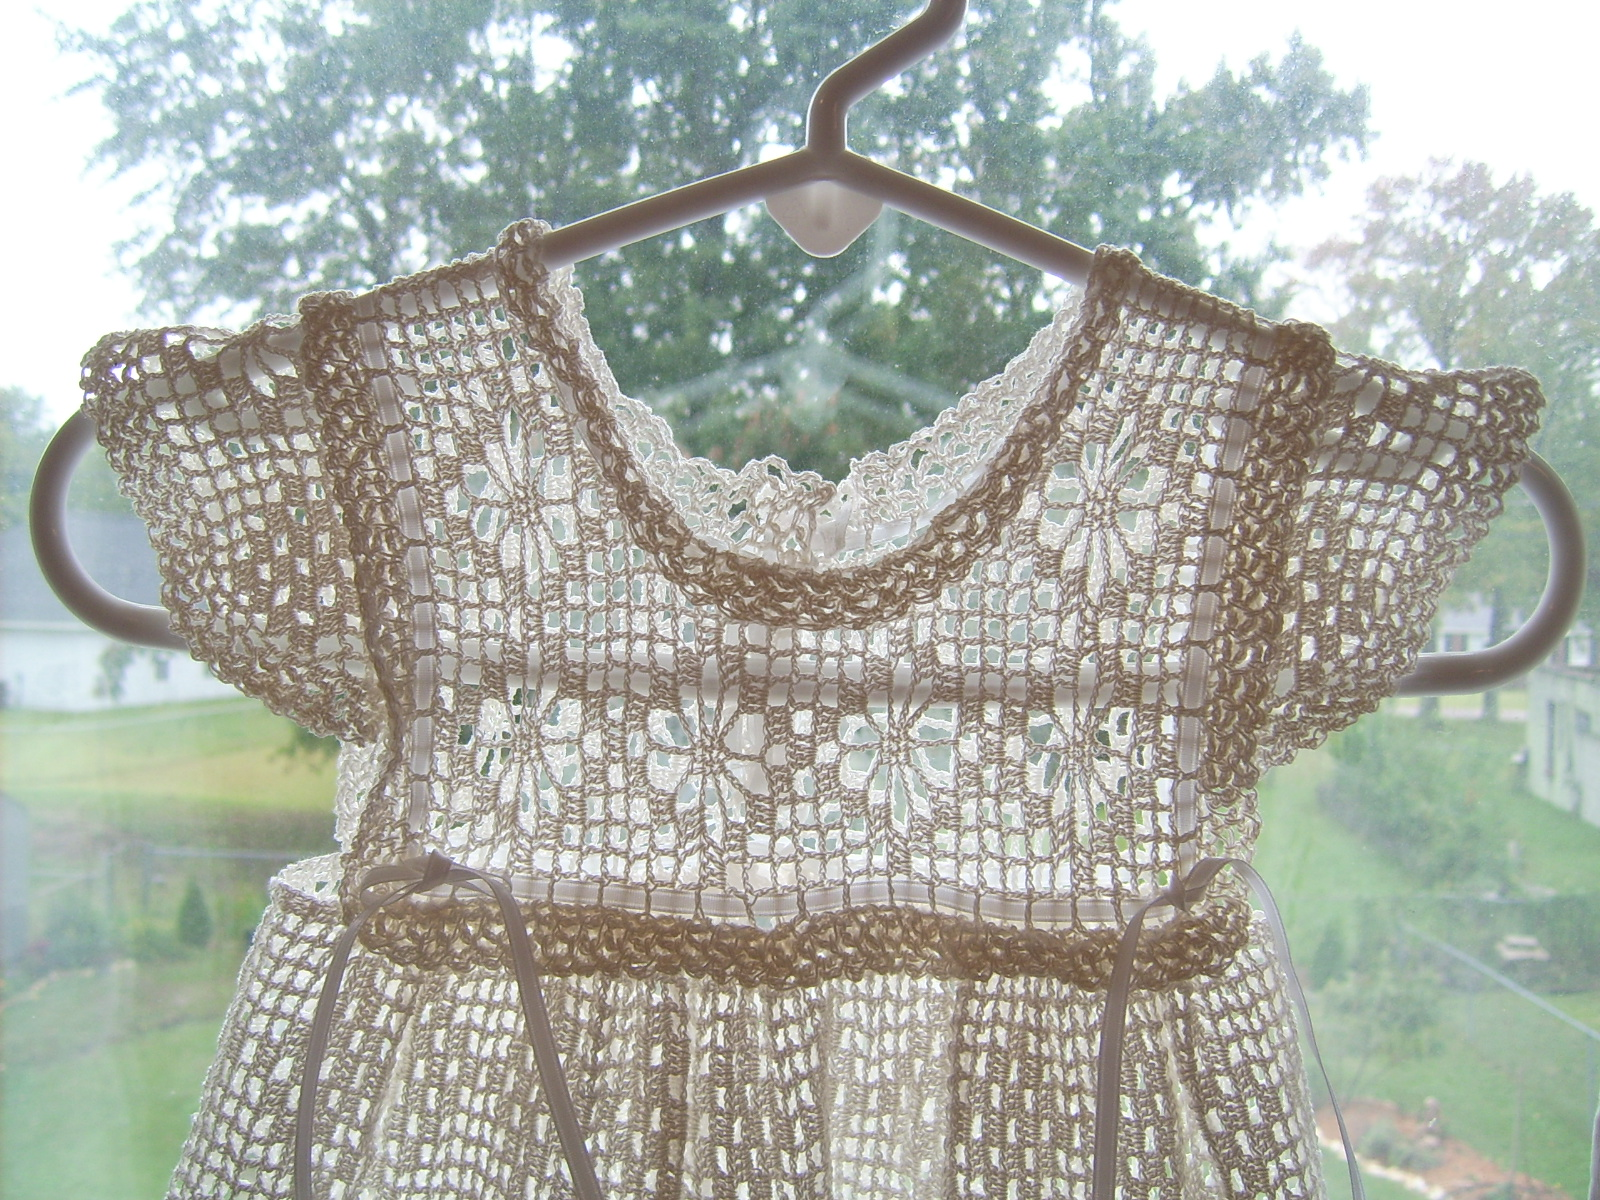 antiquebeginnings: Hand Crochet Antique Baby Dress reproduction